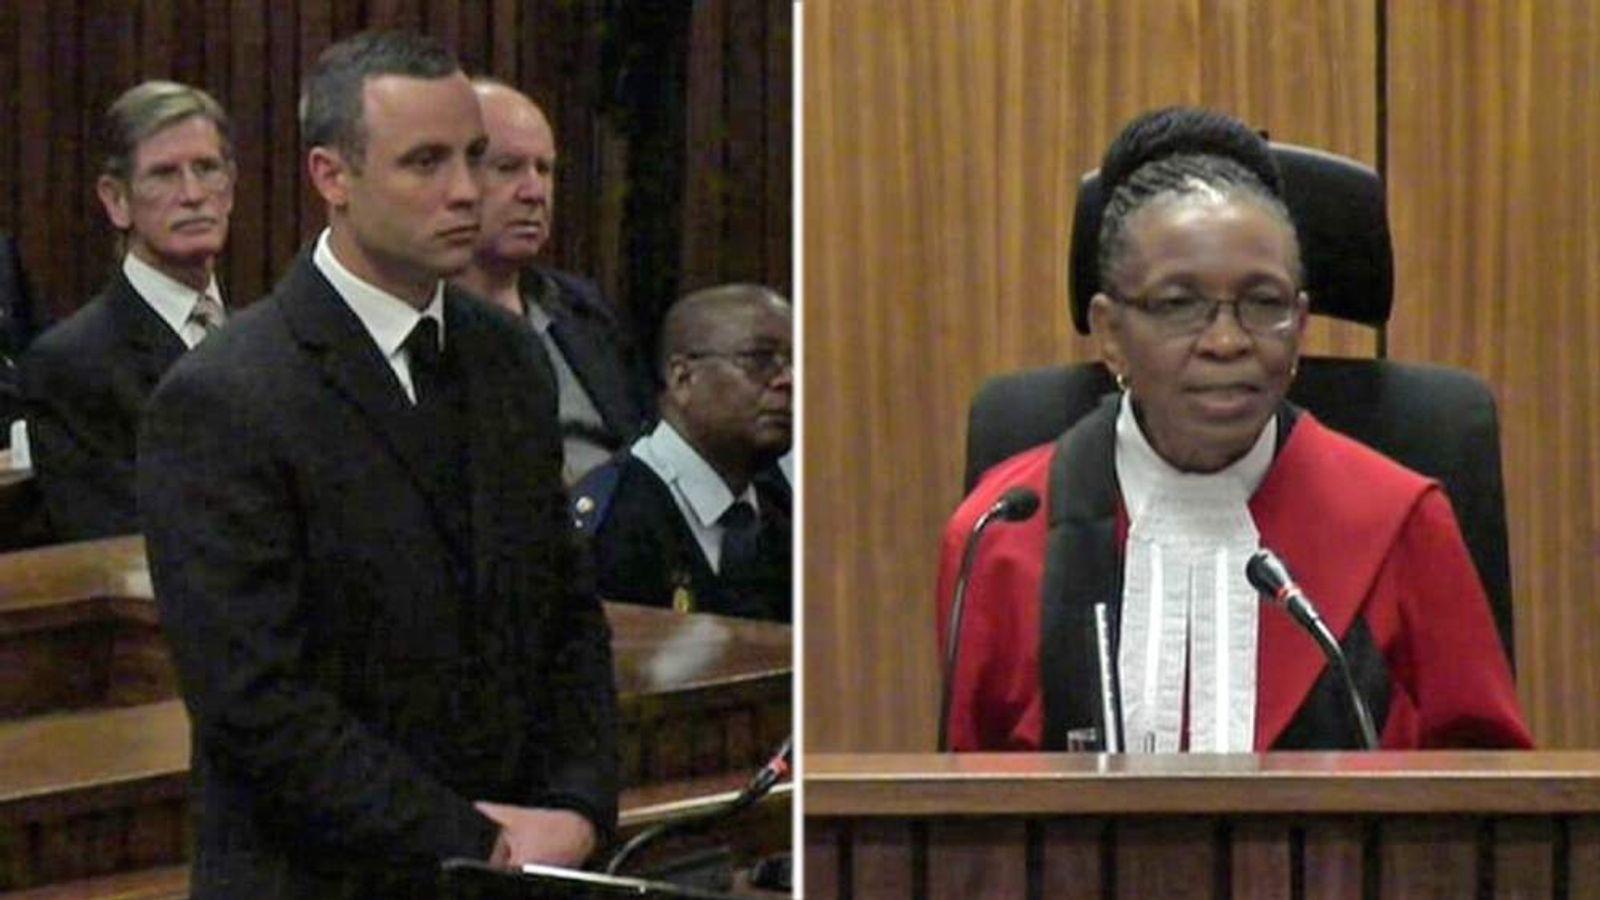 Oscar Pistorius and Judge Thokozile Masipa